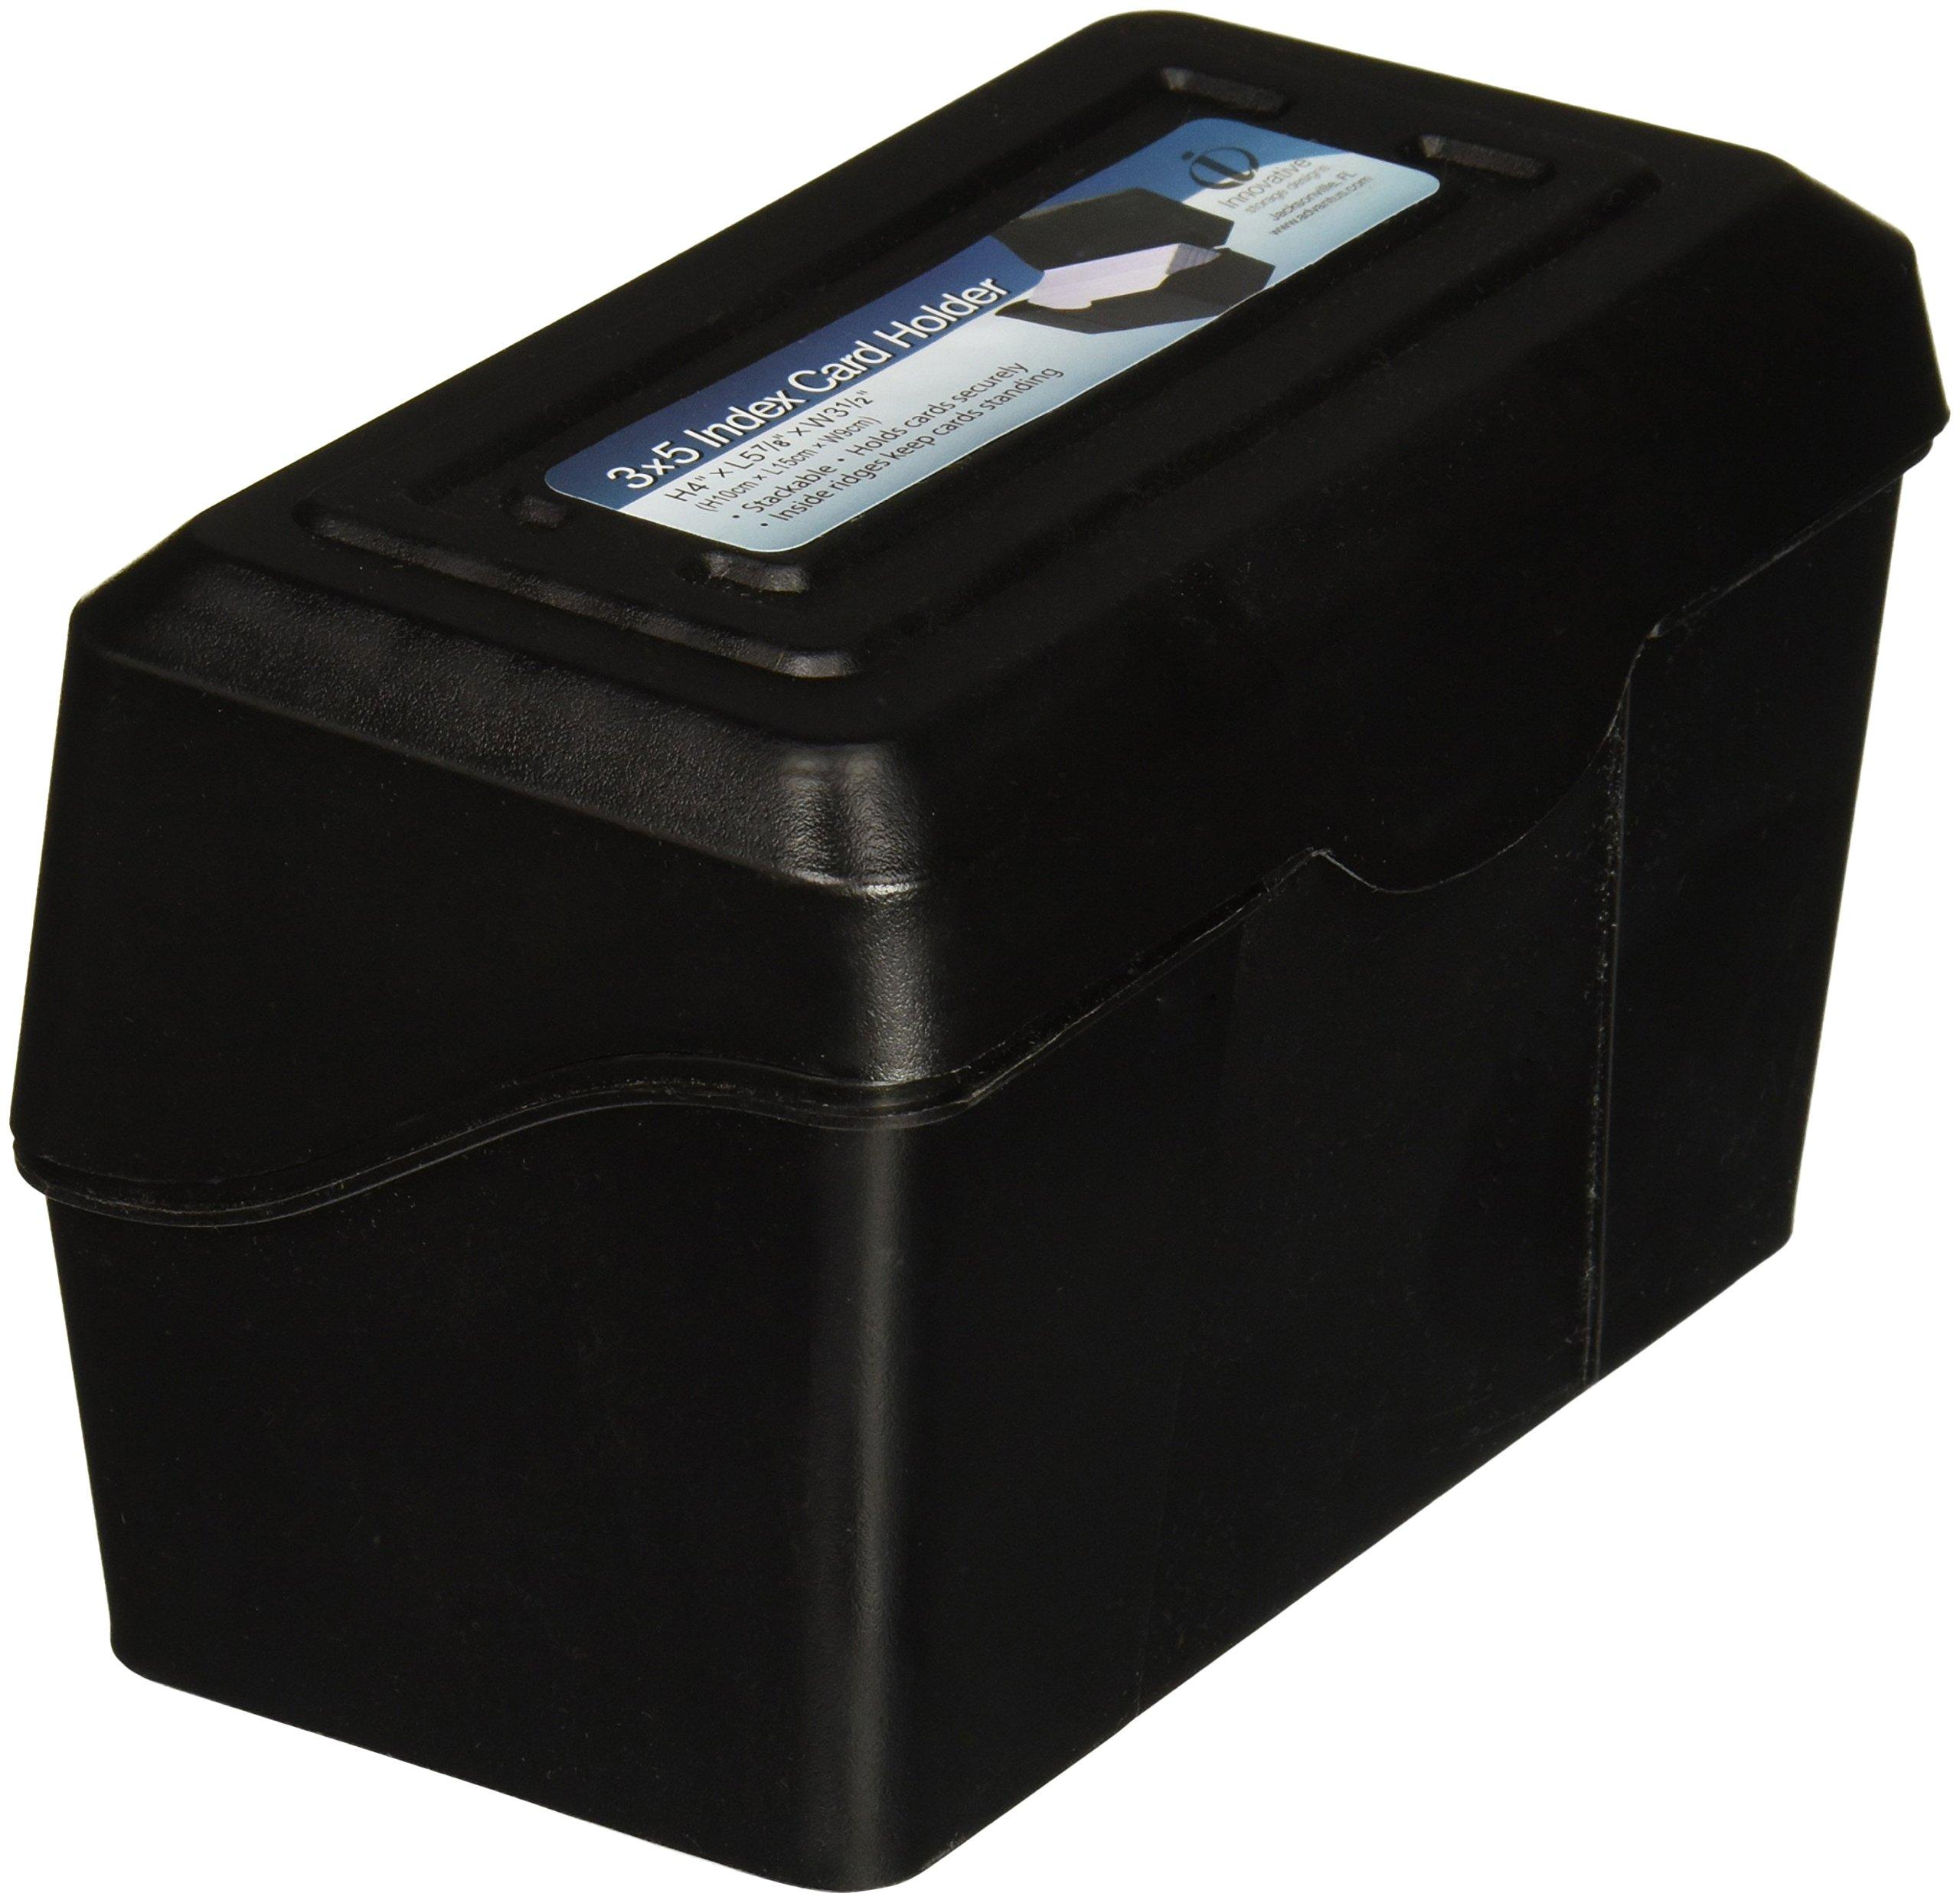 "Advantus 45001 Index Card Box, Plastic, 3"" x 5"" Size, 3.73"" Height, 3.5"" Width, 6.3"" Length, Black"